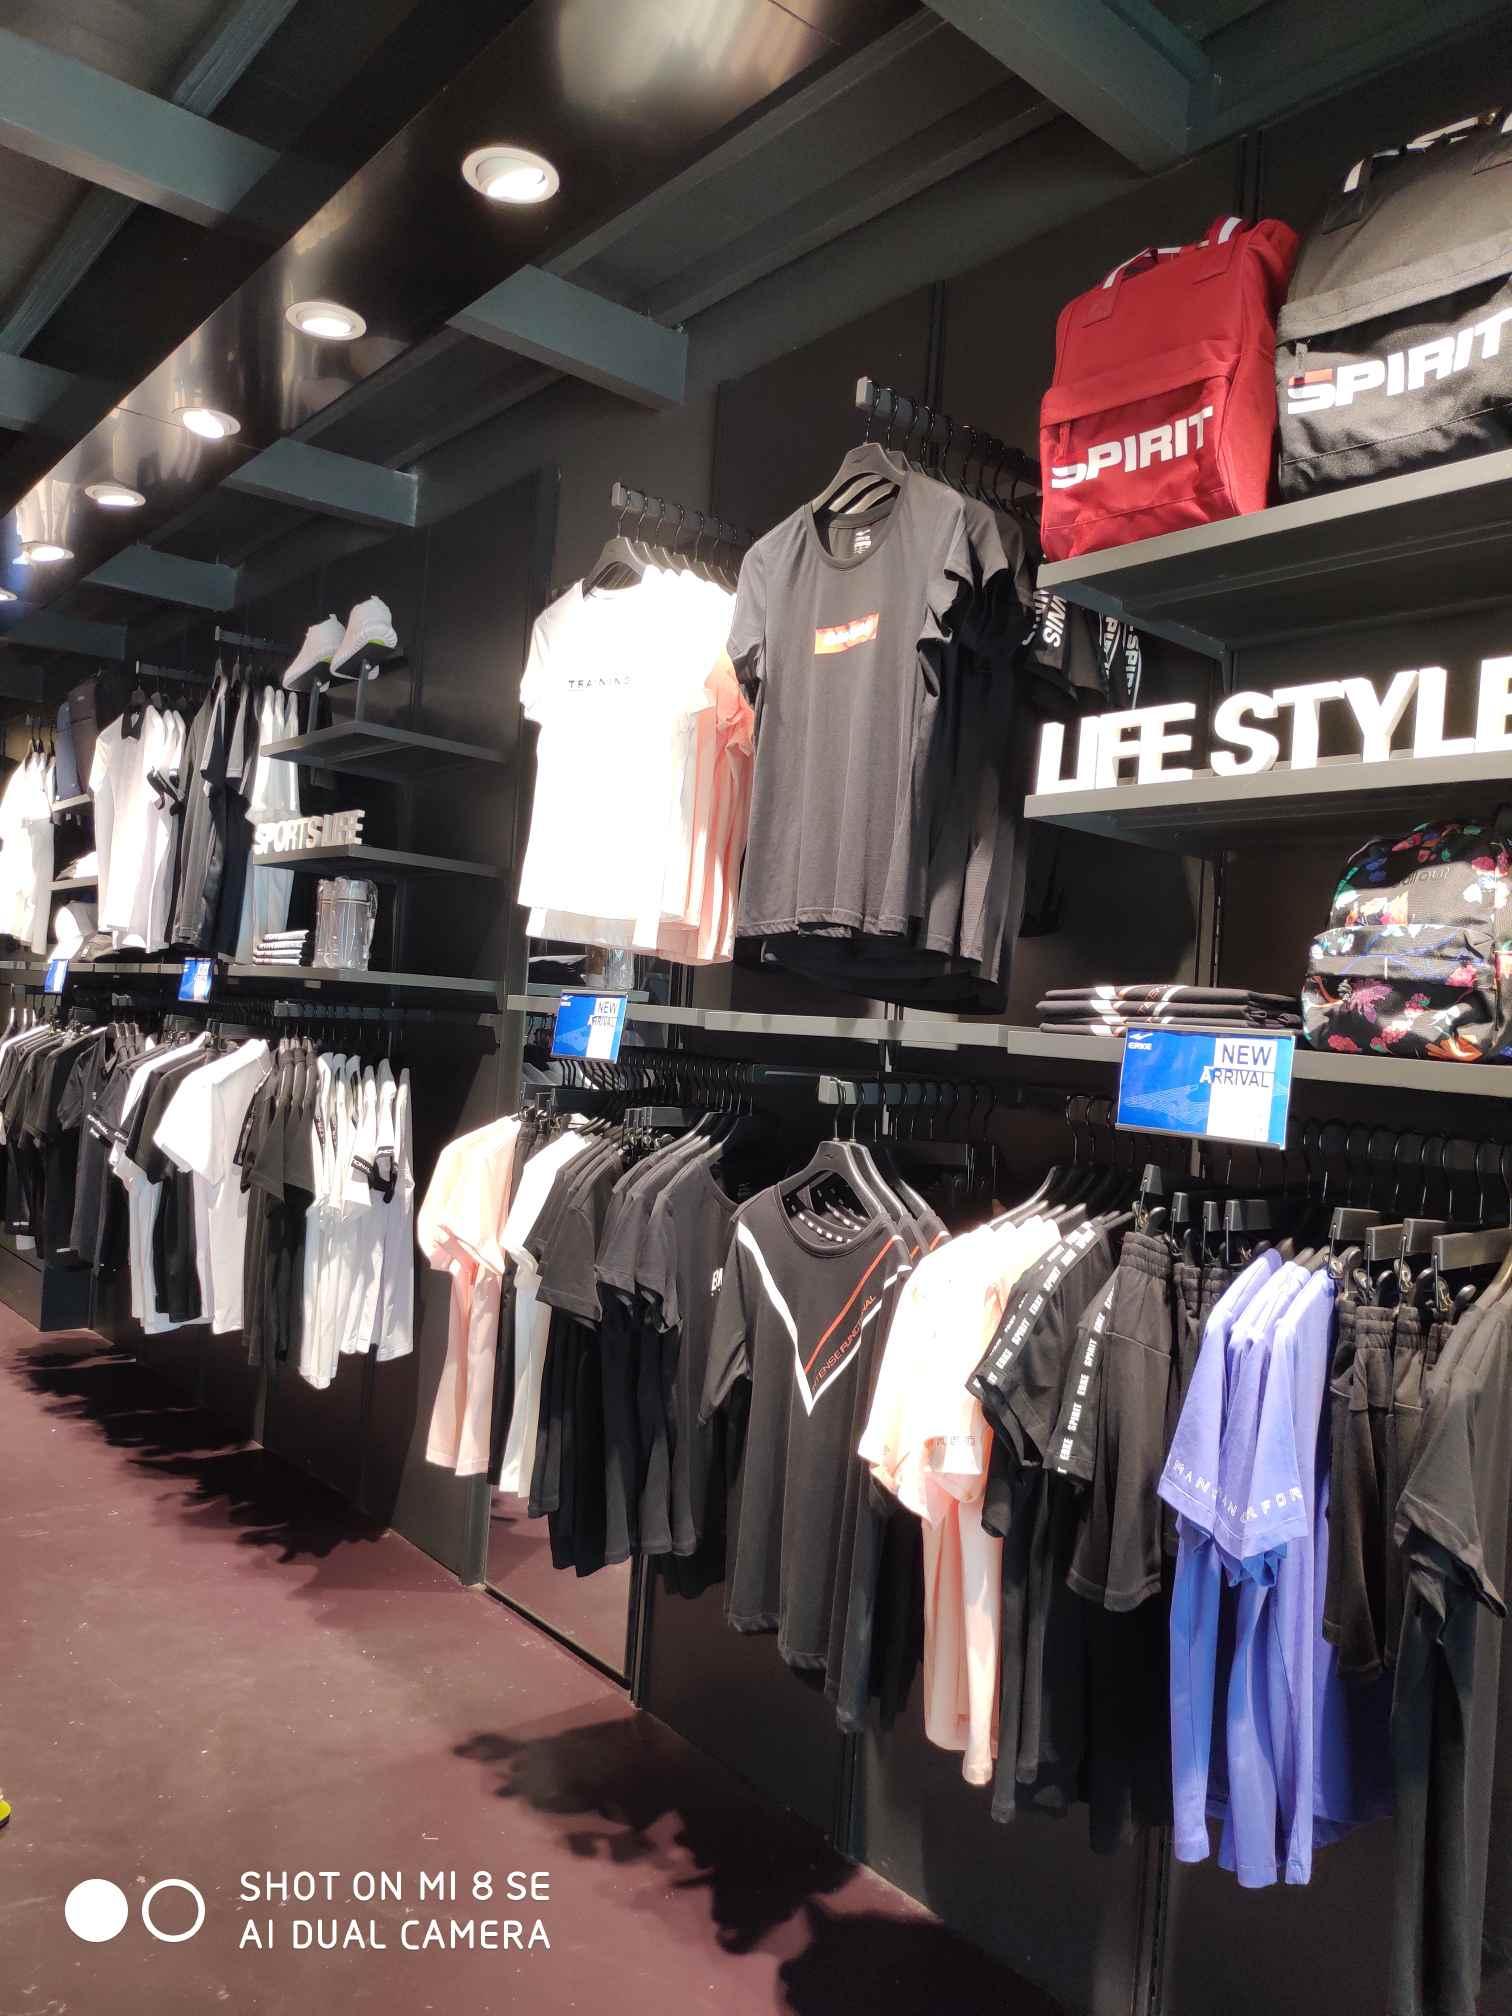 Pha-an Shop